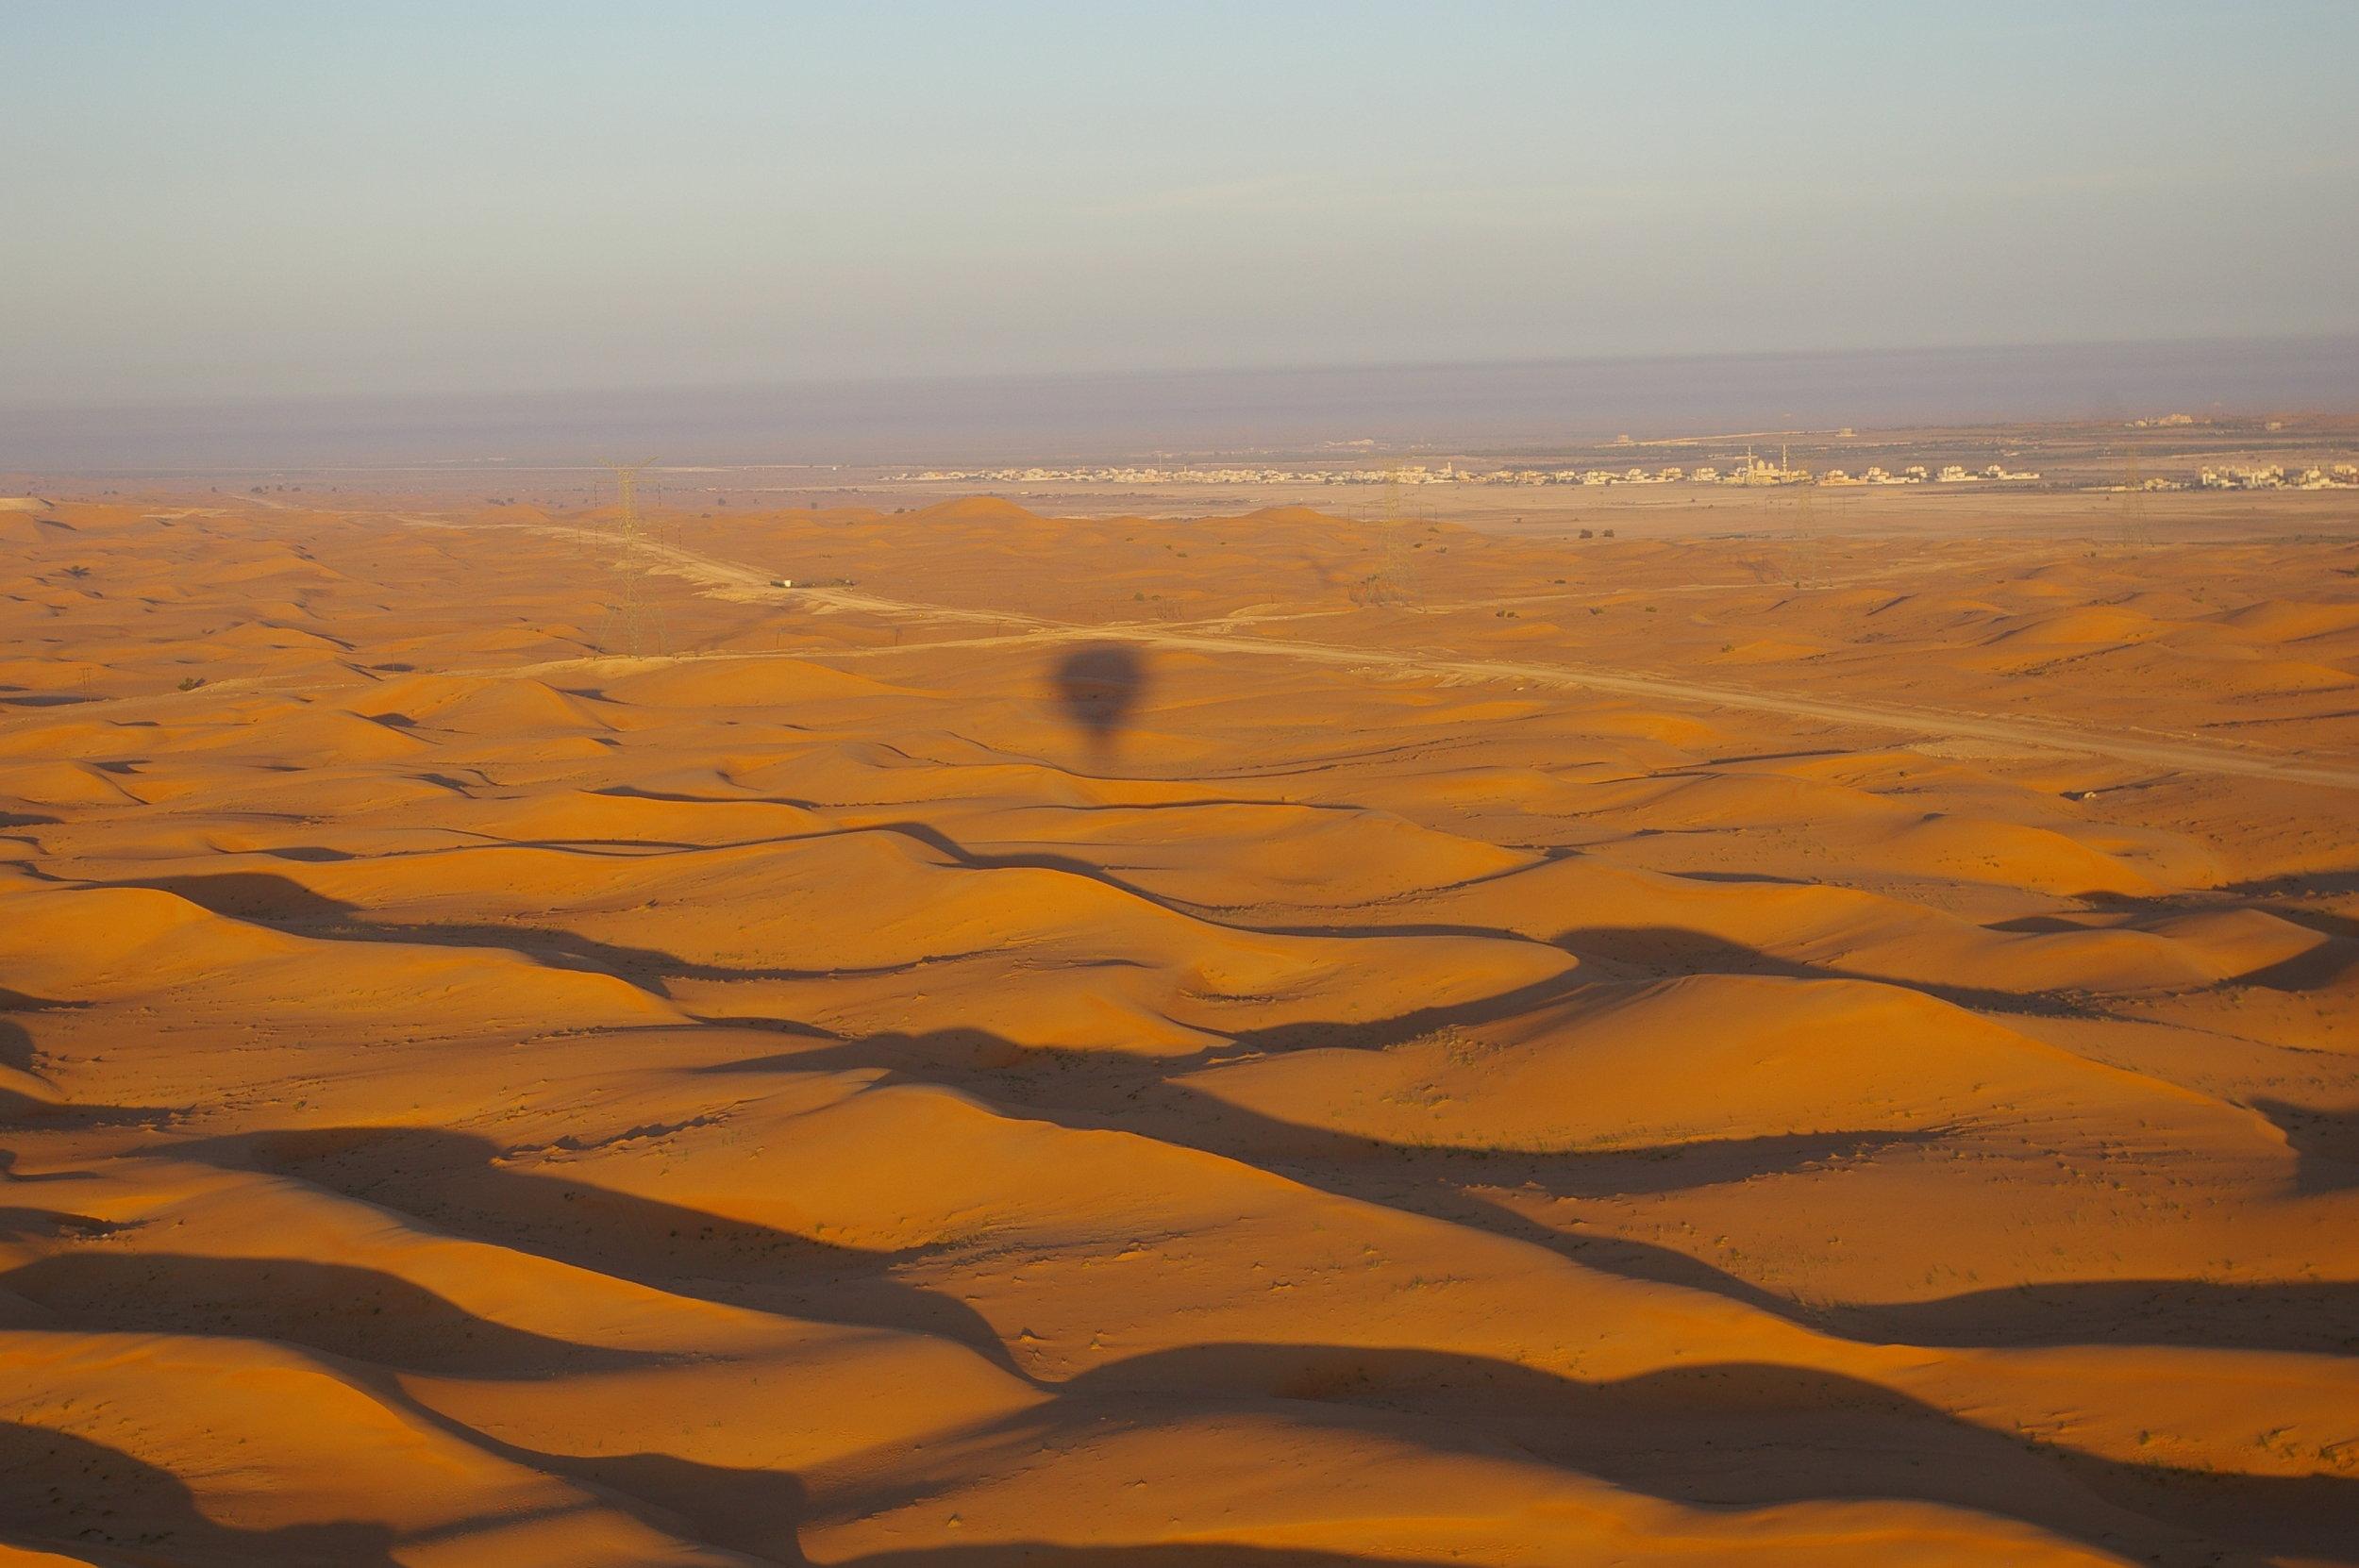 Desert_near_Al_Ain.jpg